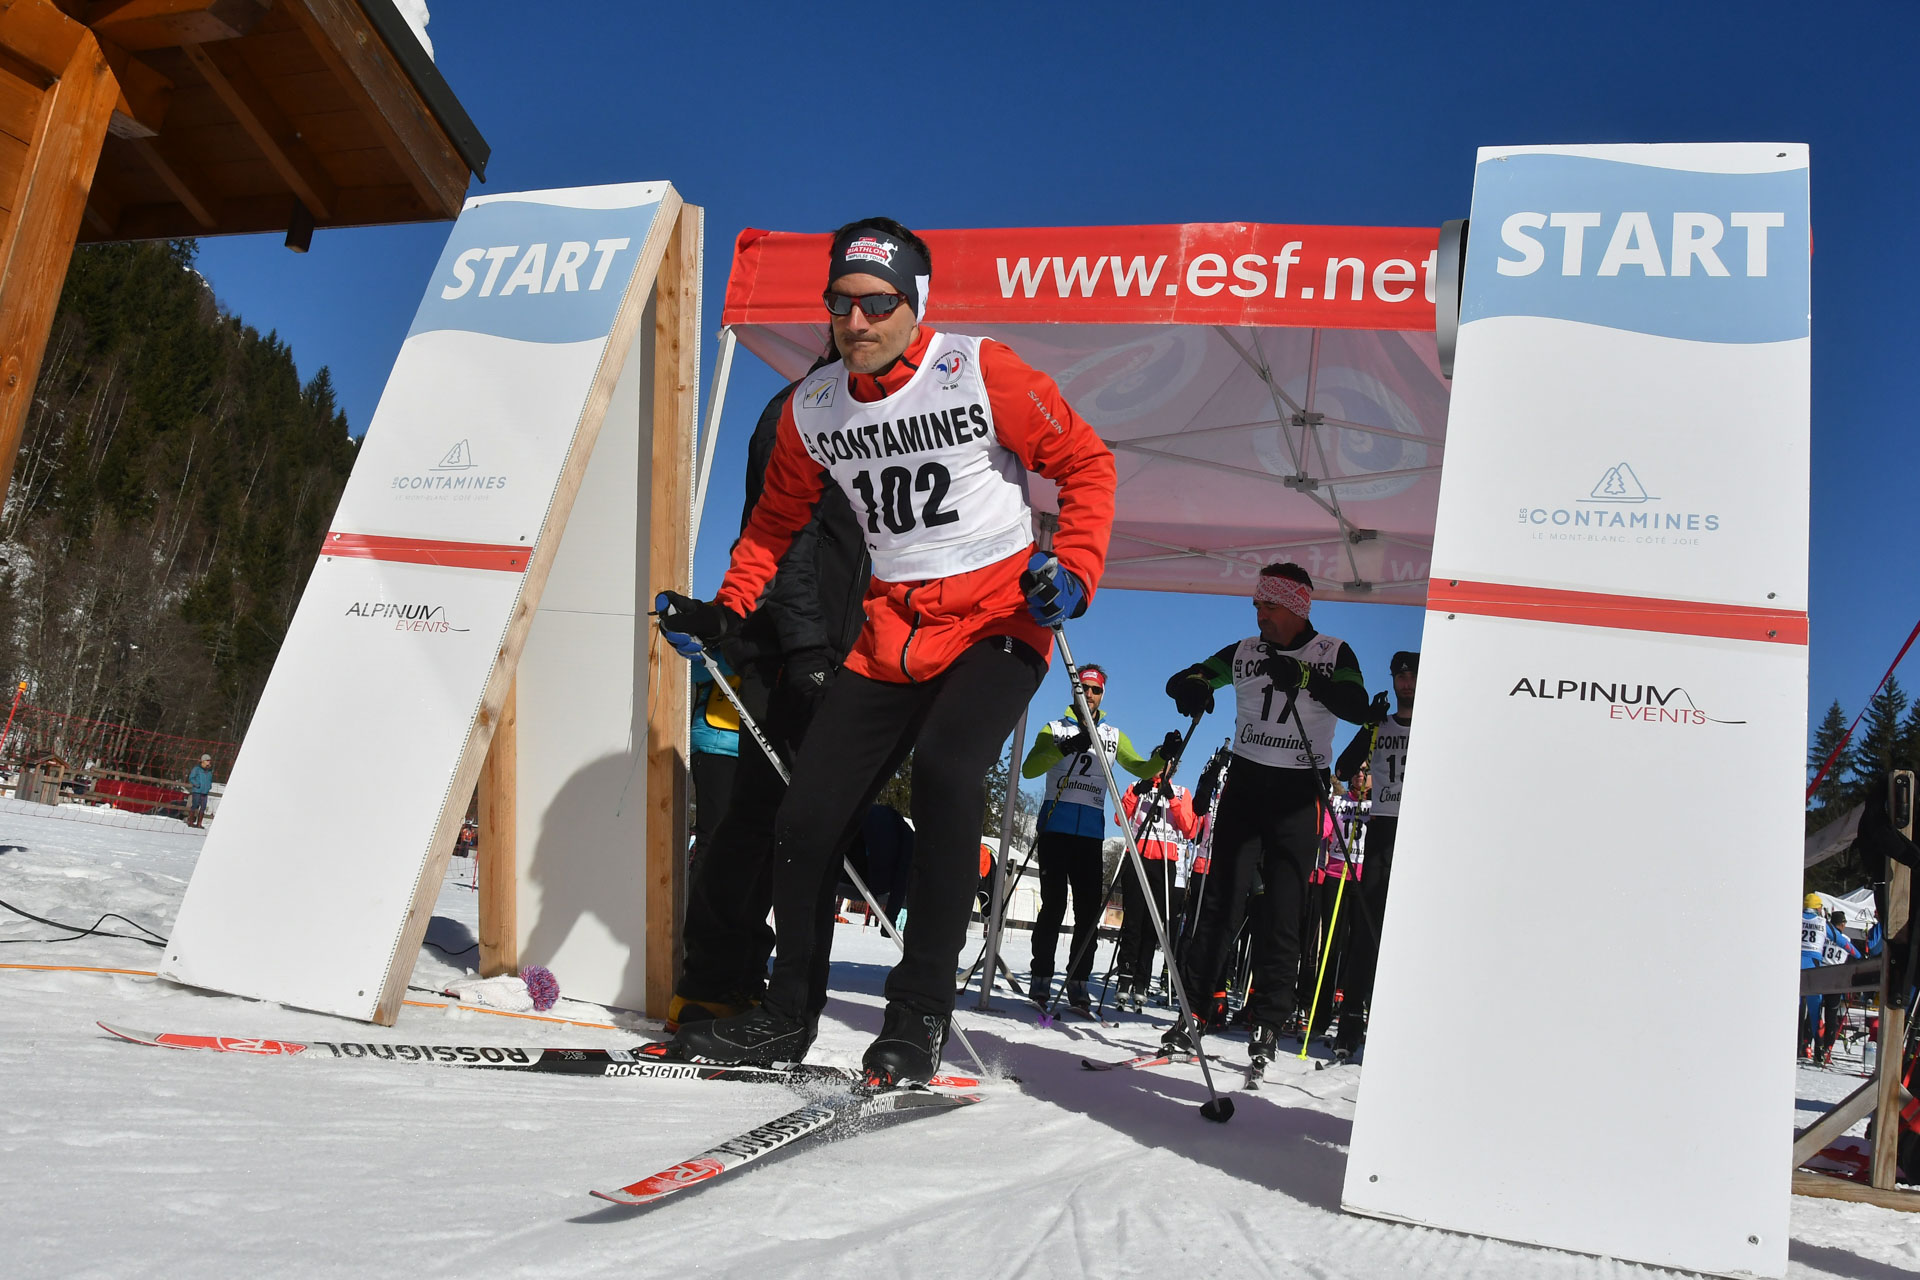 Alpinum-Biathlon-Impulse-Tour-2019©JulieRuly_082